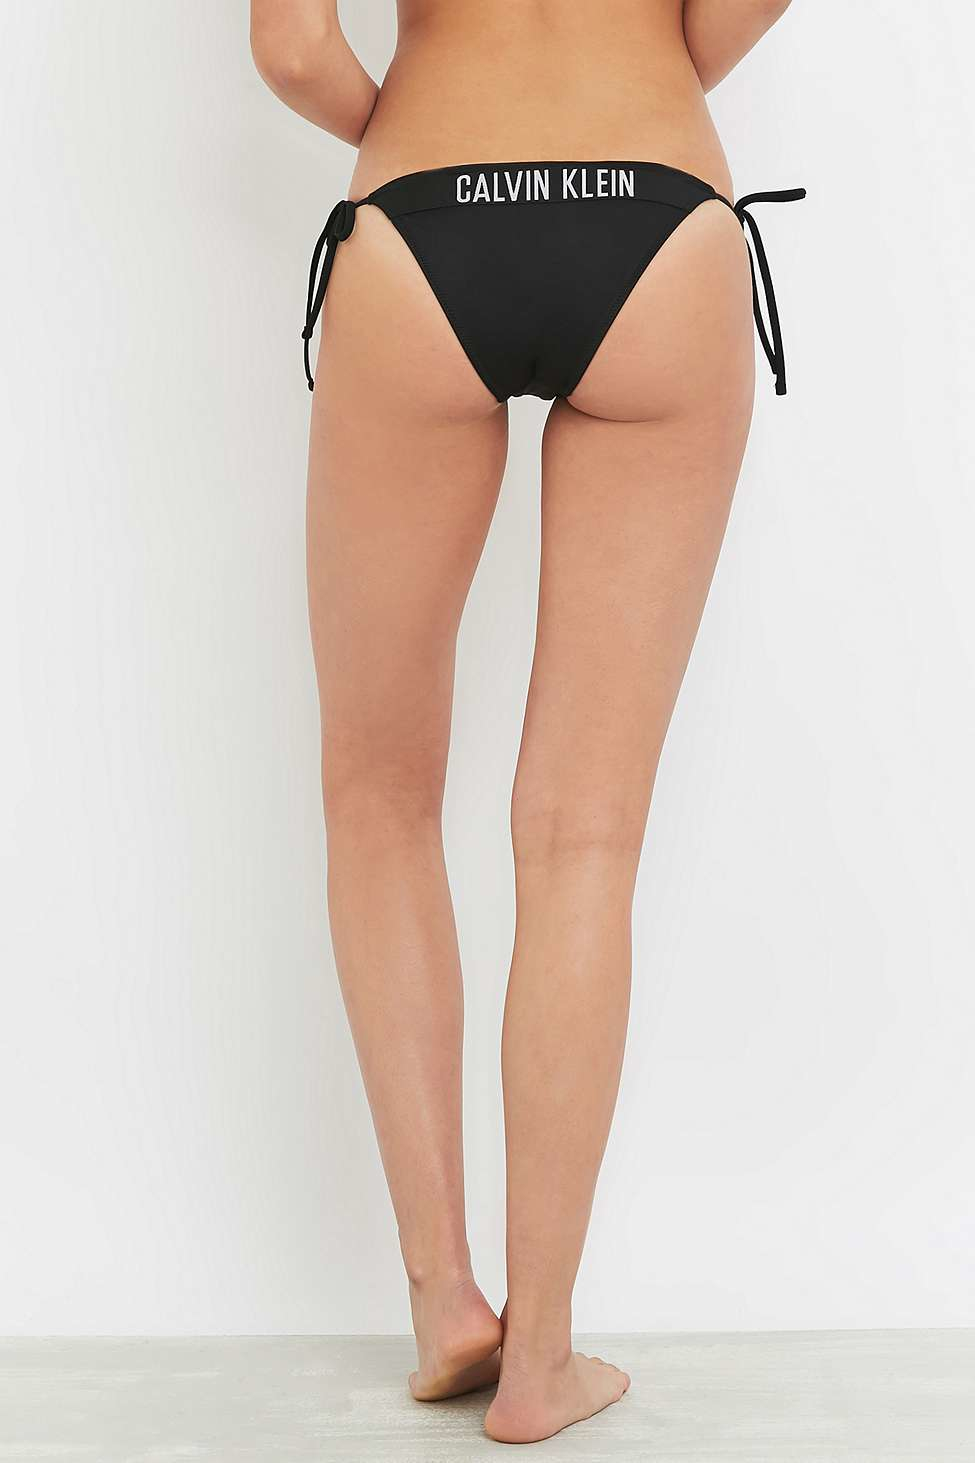 black string bikini bottoms - photo #33